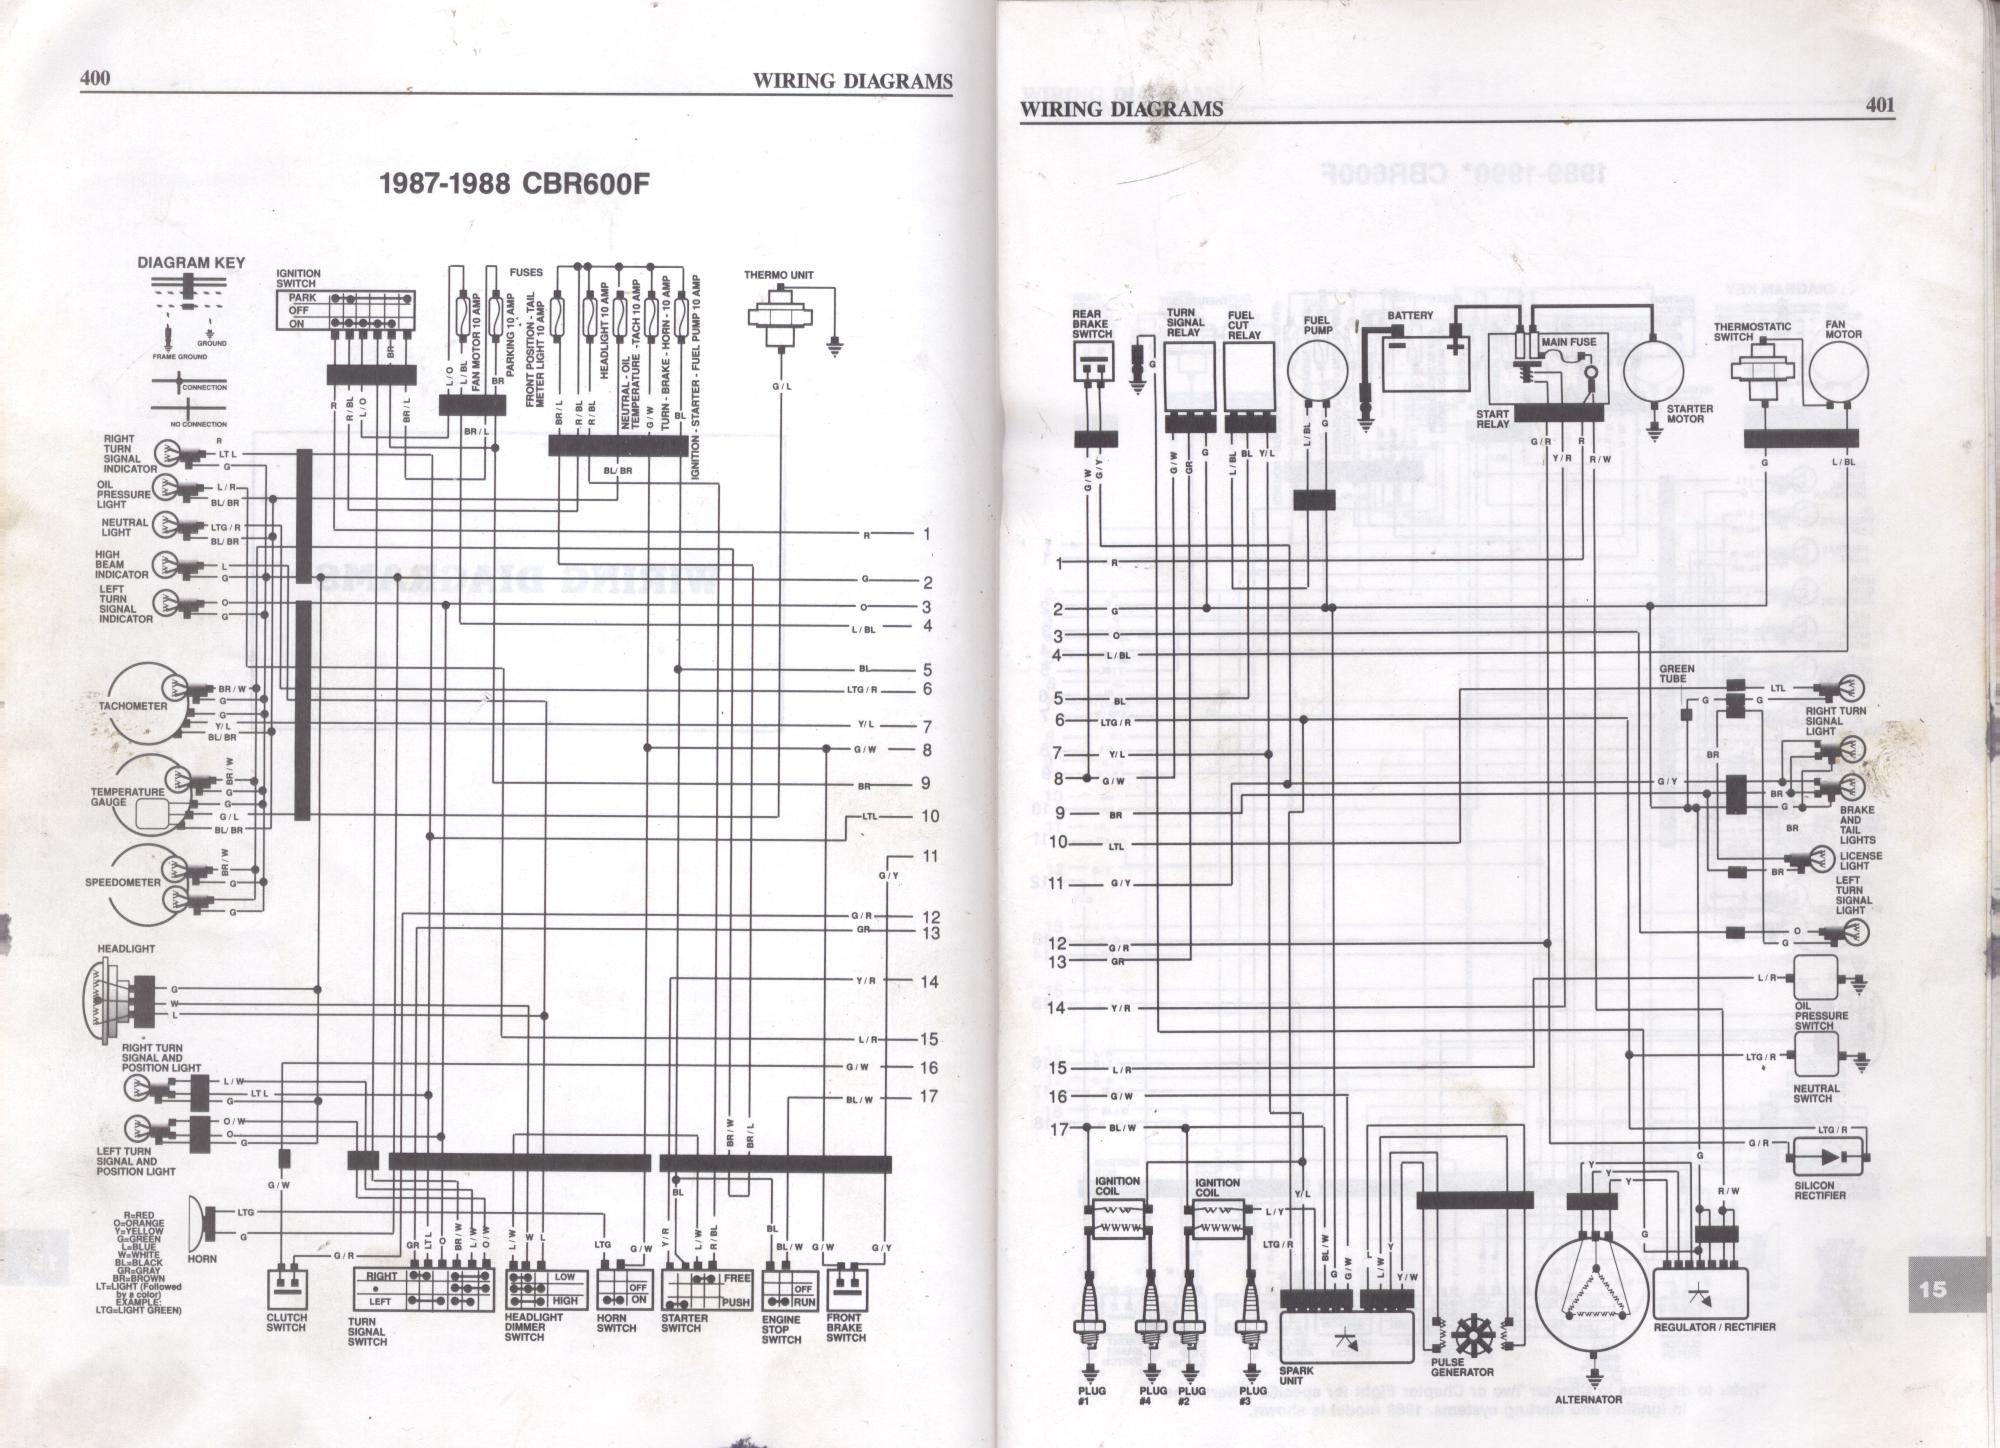 Honda Blackbird Wiring Diagram Wiring Diagram With Jzgreentowncom